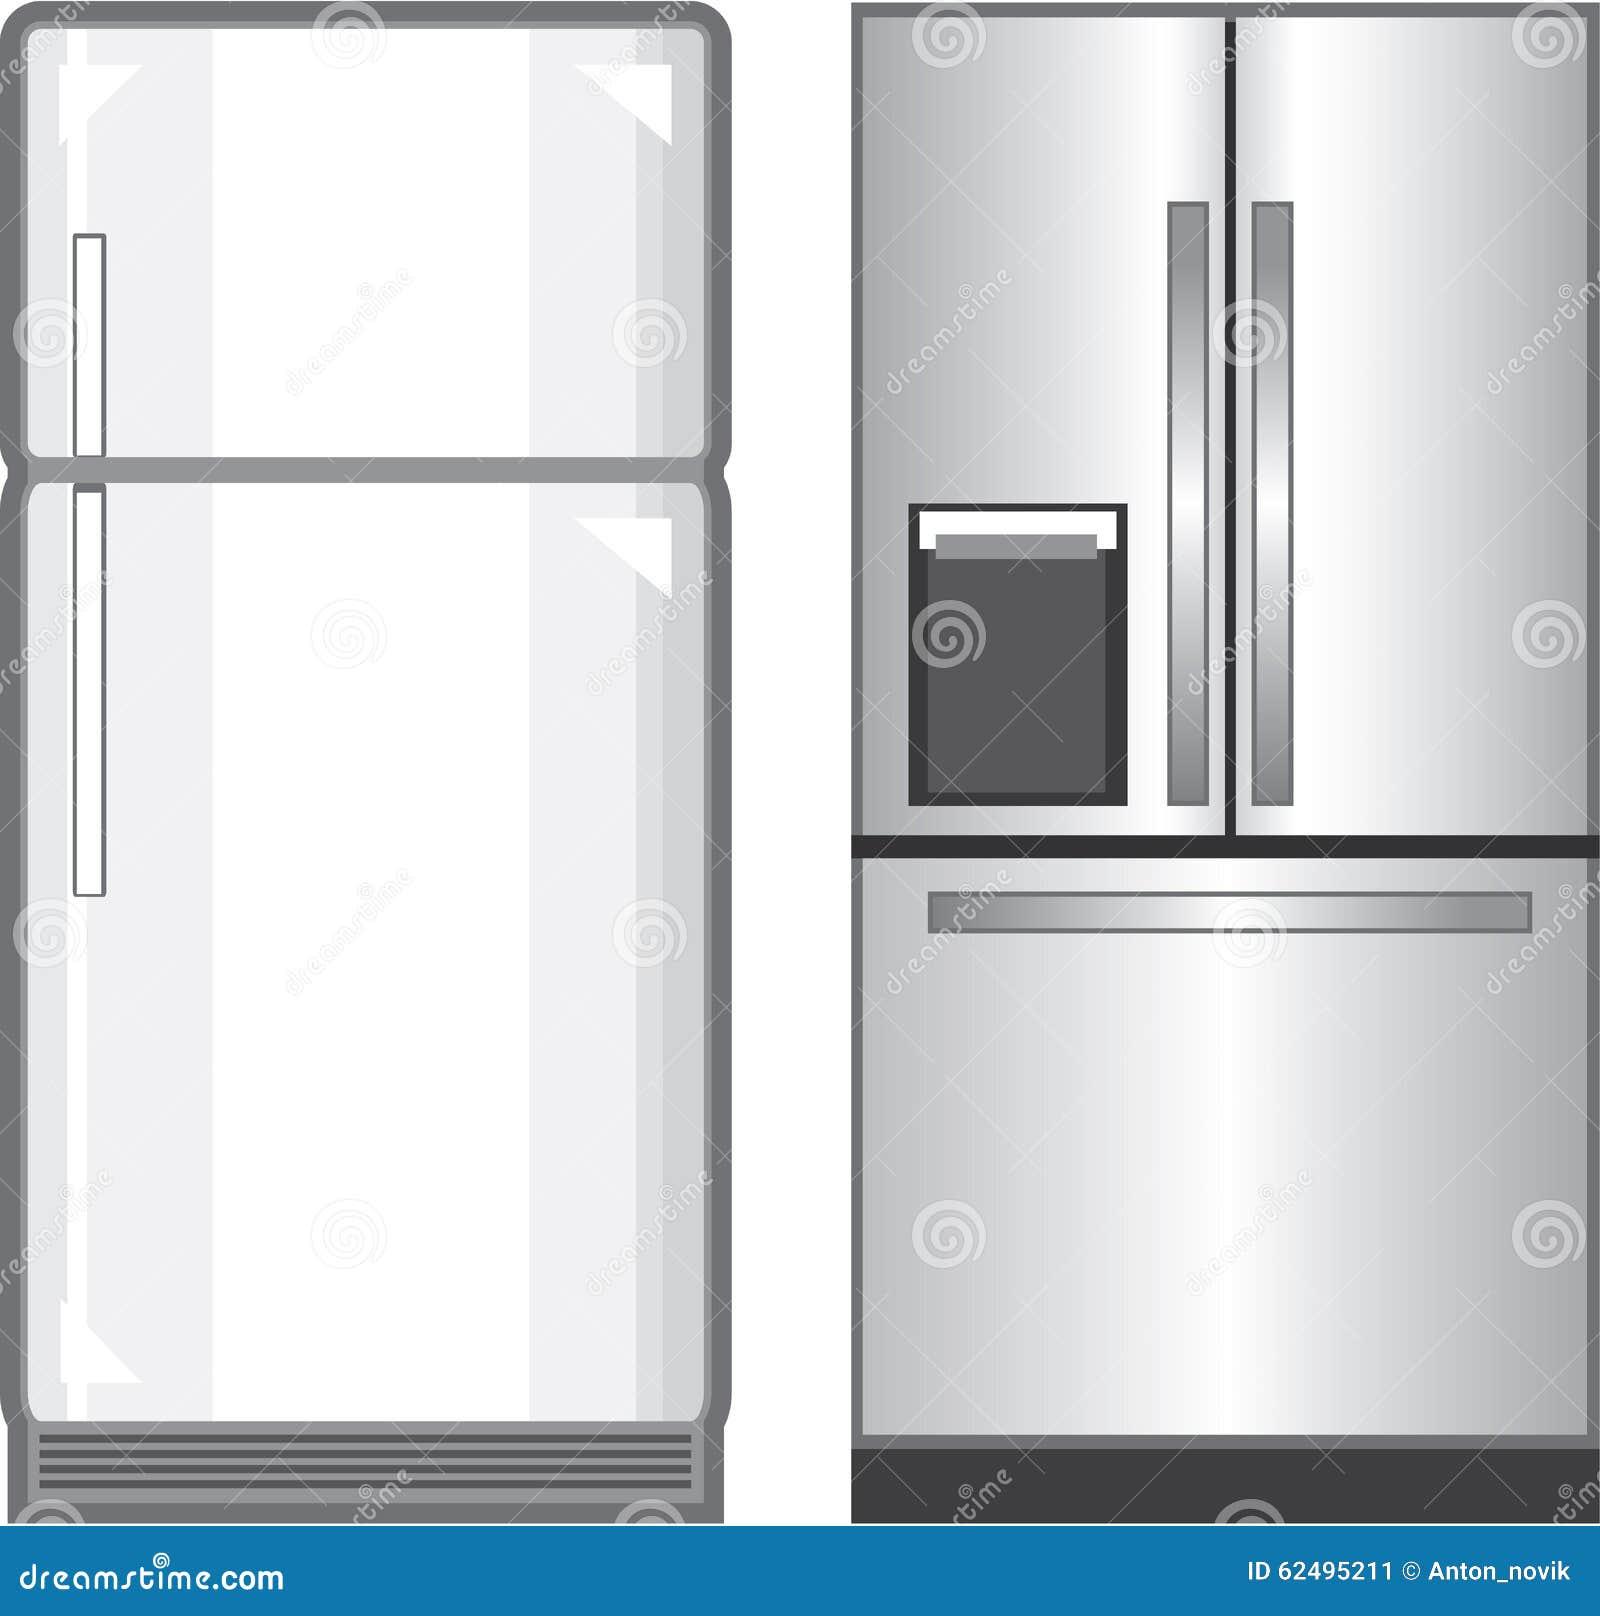 Messy Fridge: Messy Refrigerator Clip Art